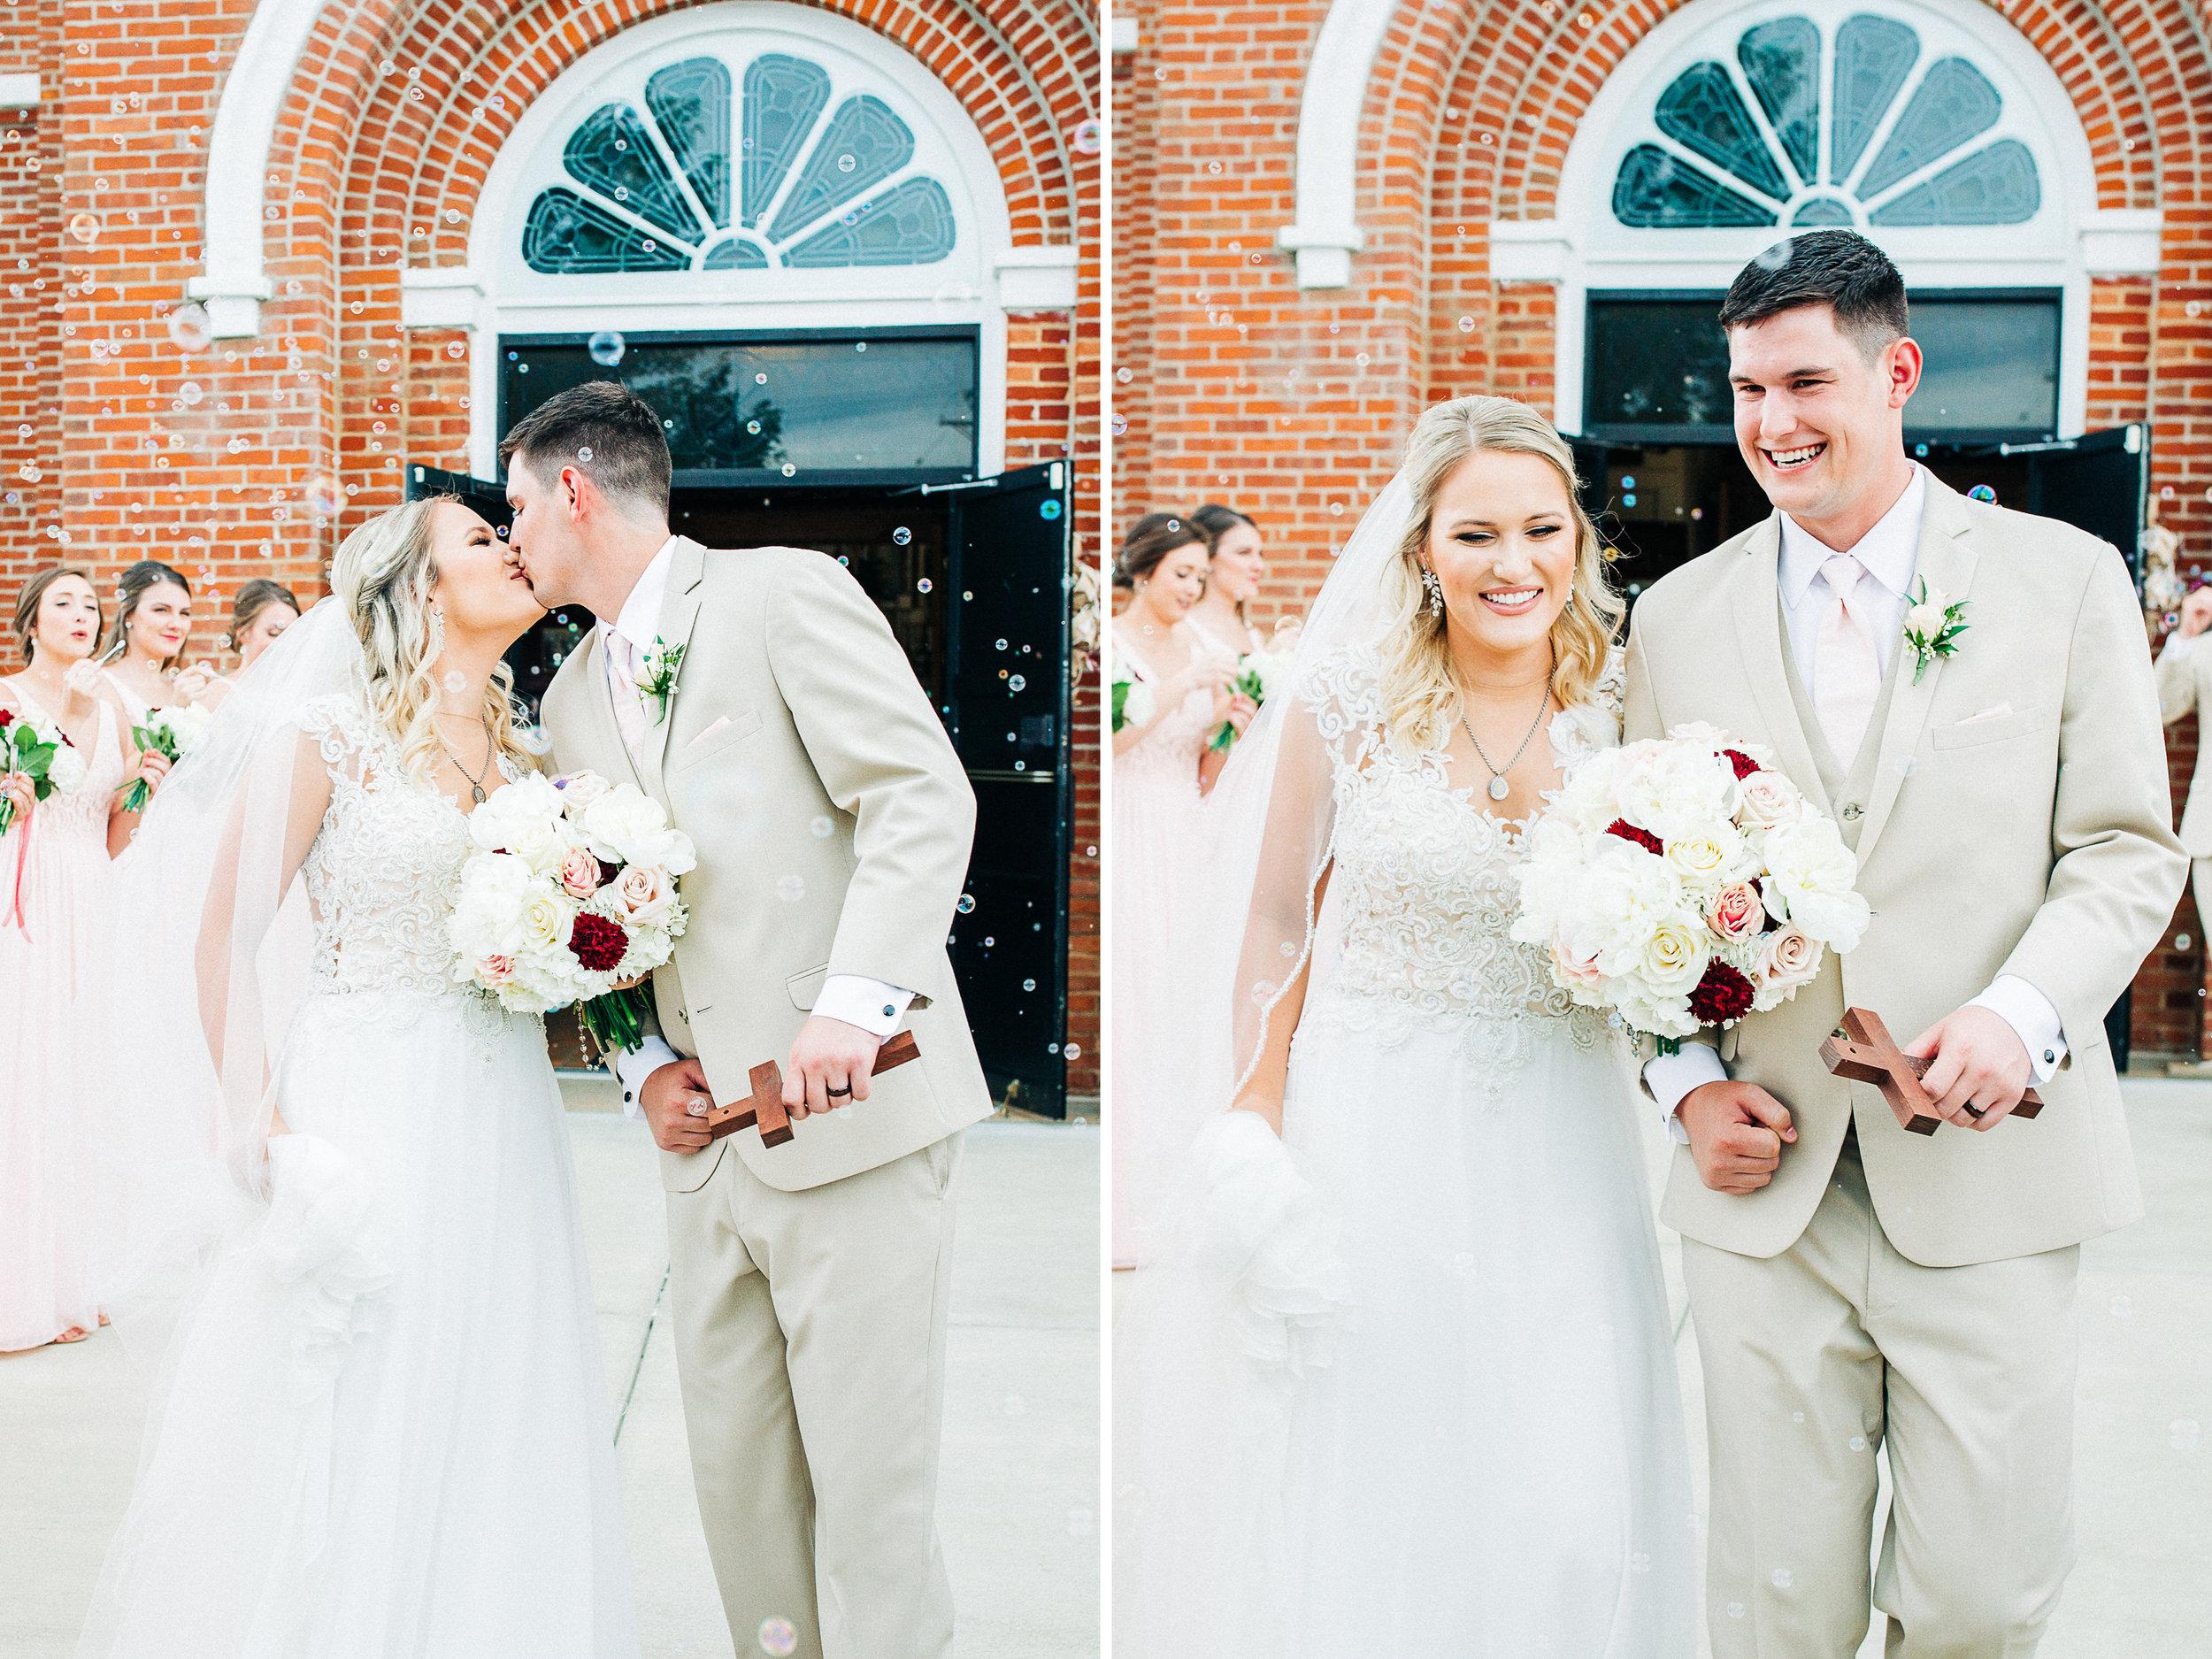 Dorothy_Louise_Photography_Marissa_Jake_Wentzville_MO_Wedding15.jpg